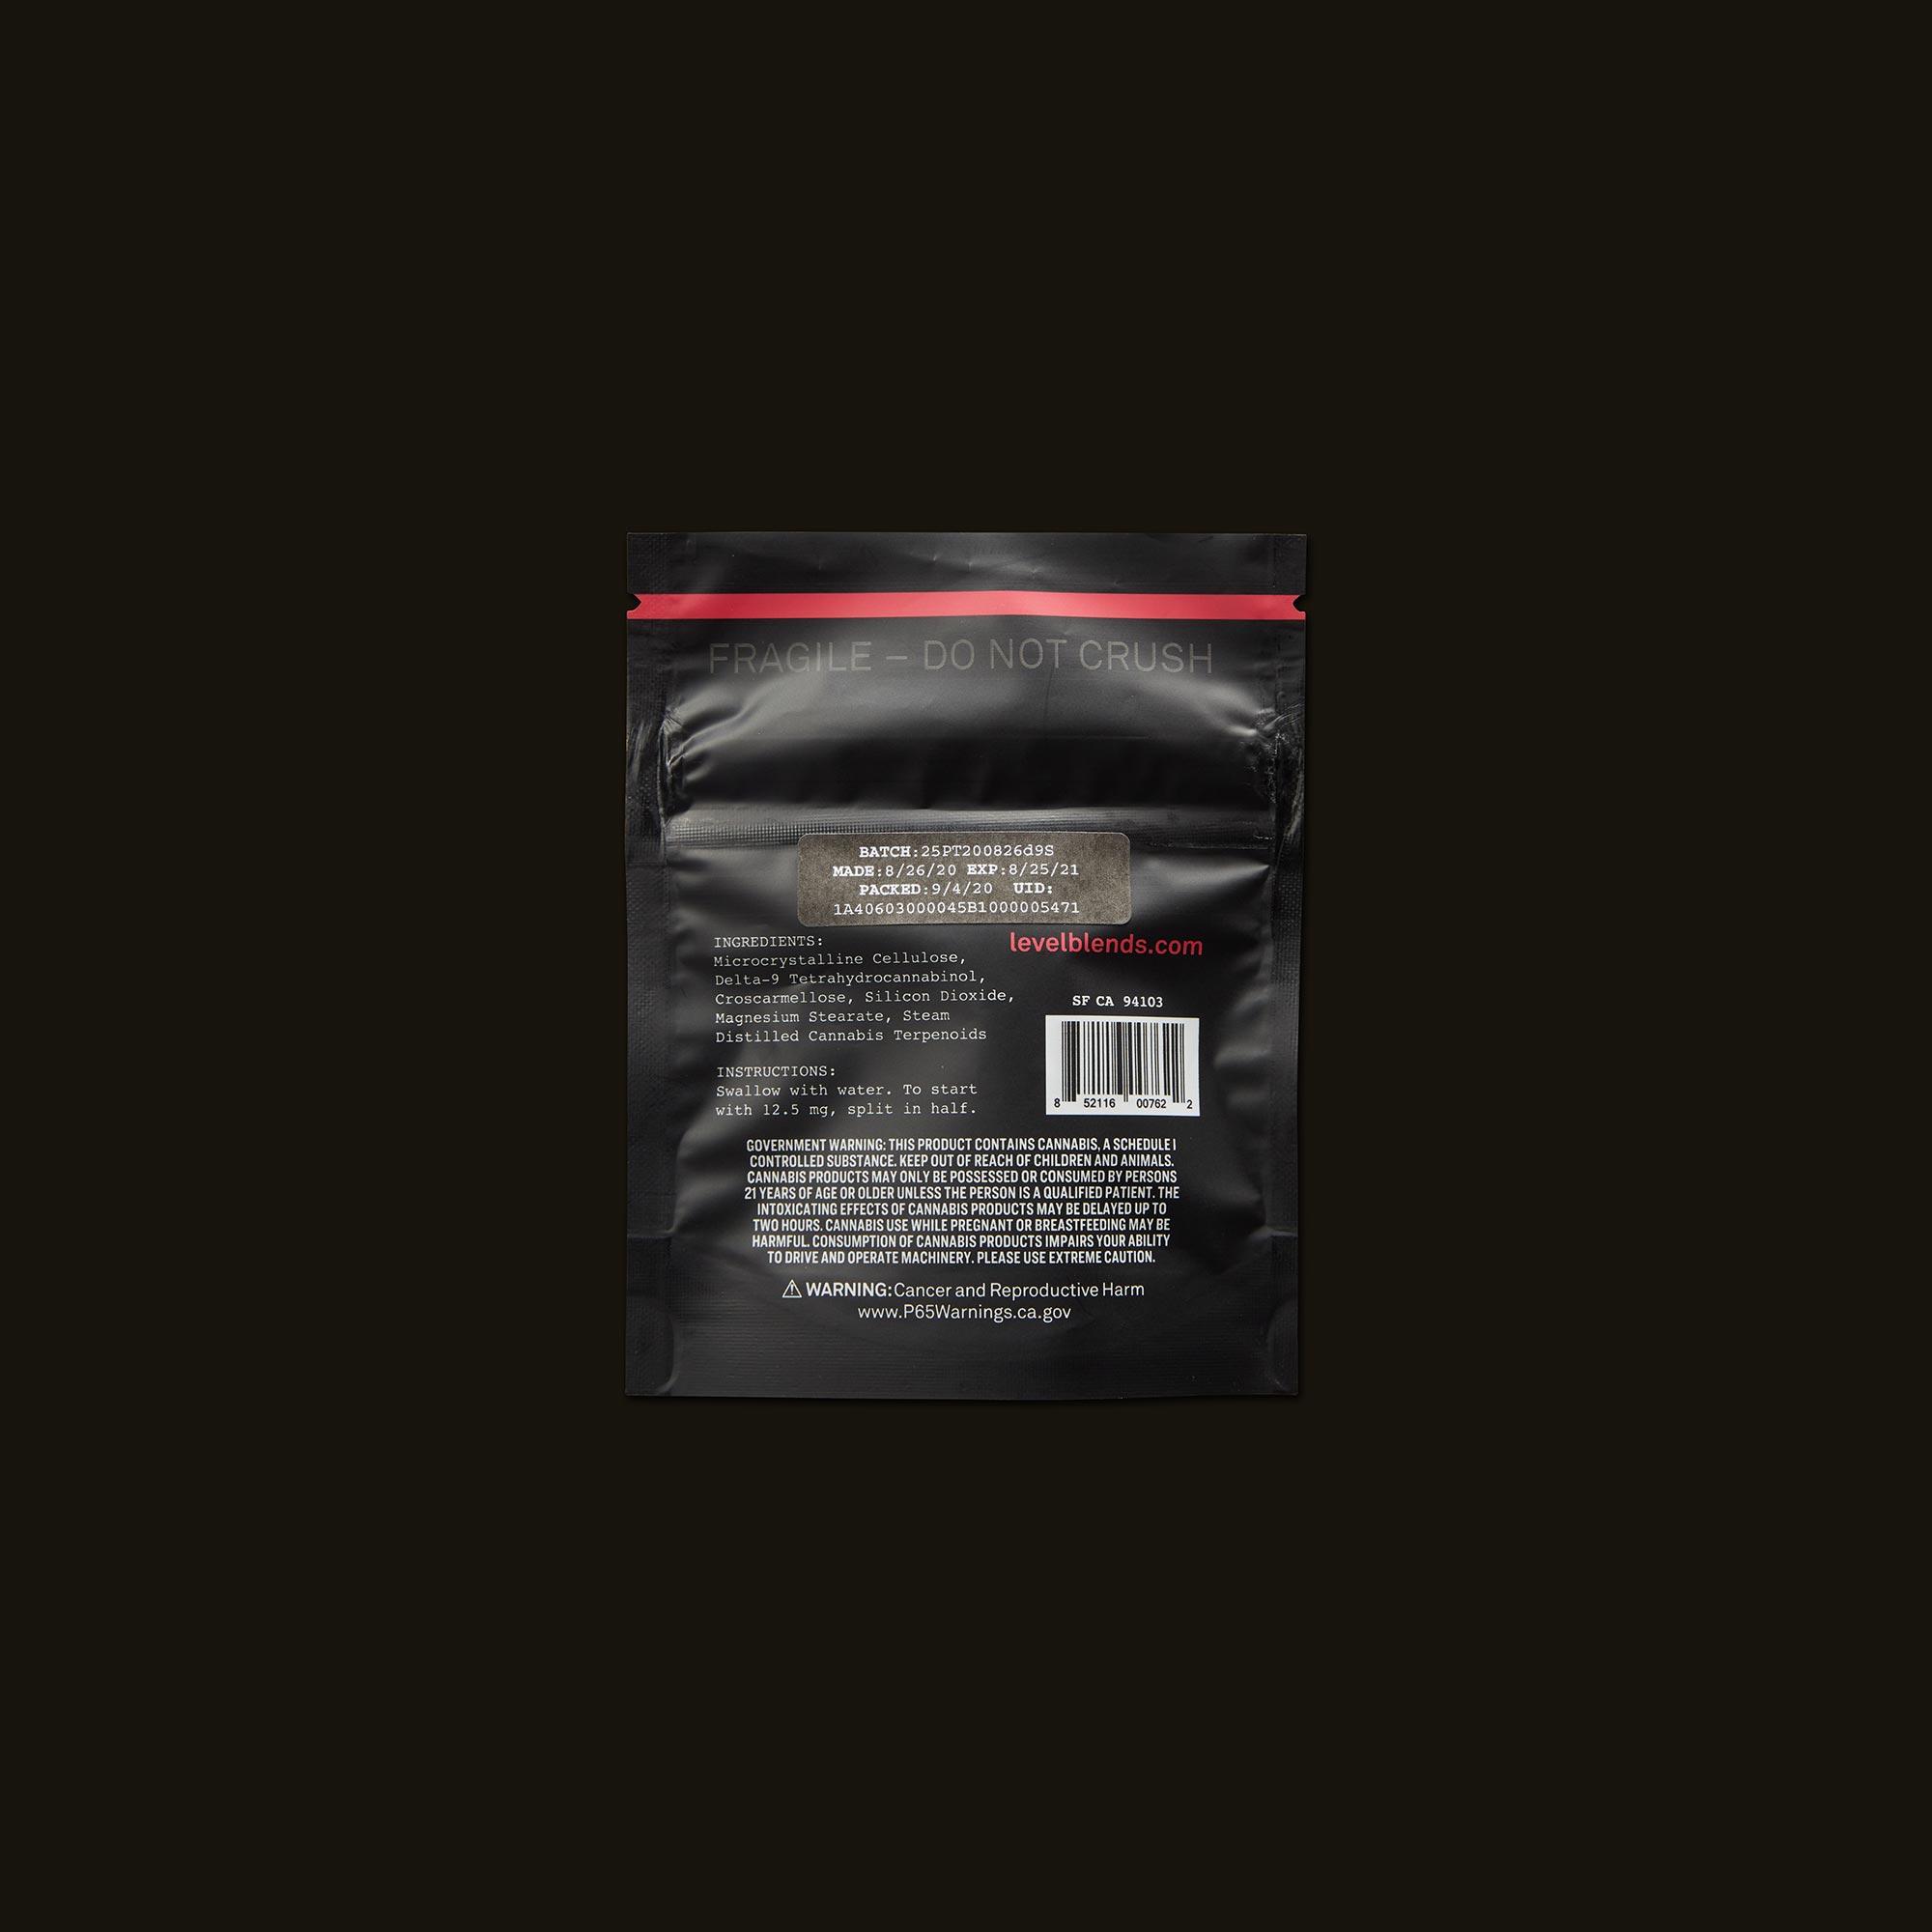 LEVEL Sativa Protab Refill Pack Ingredients